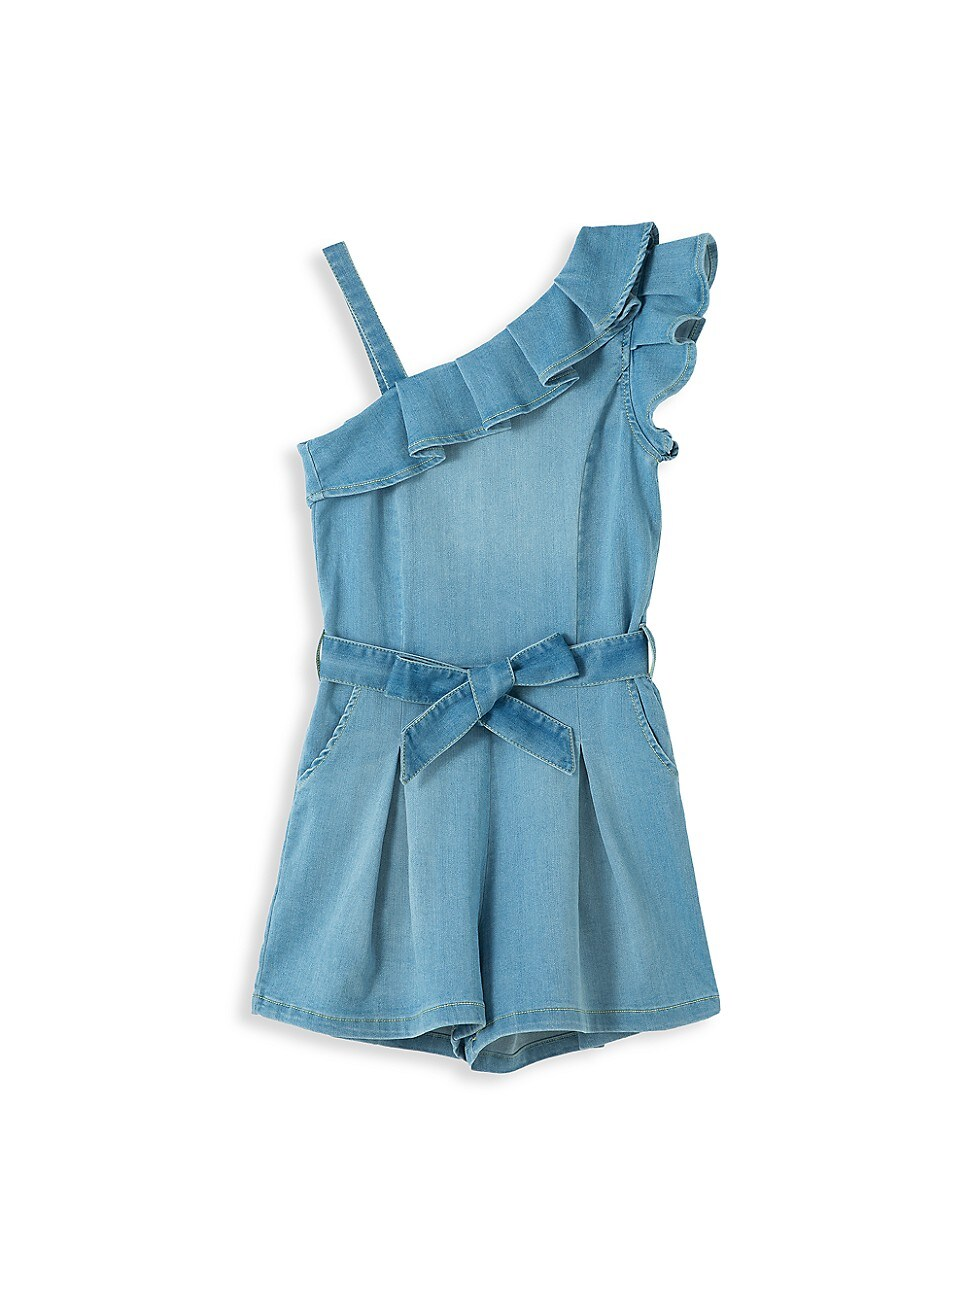 Habitual Dresses LITTLE GIRL'S OFF-THE-SHOULDER RUFFLE ROMPER